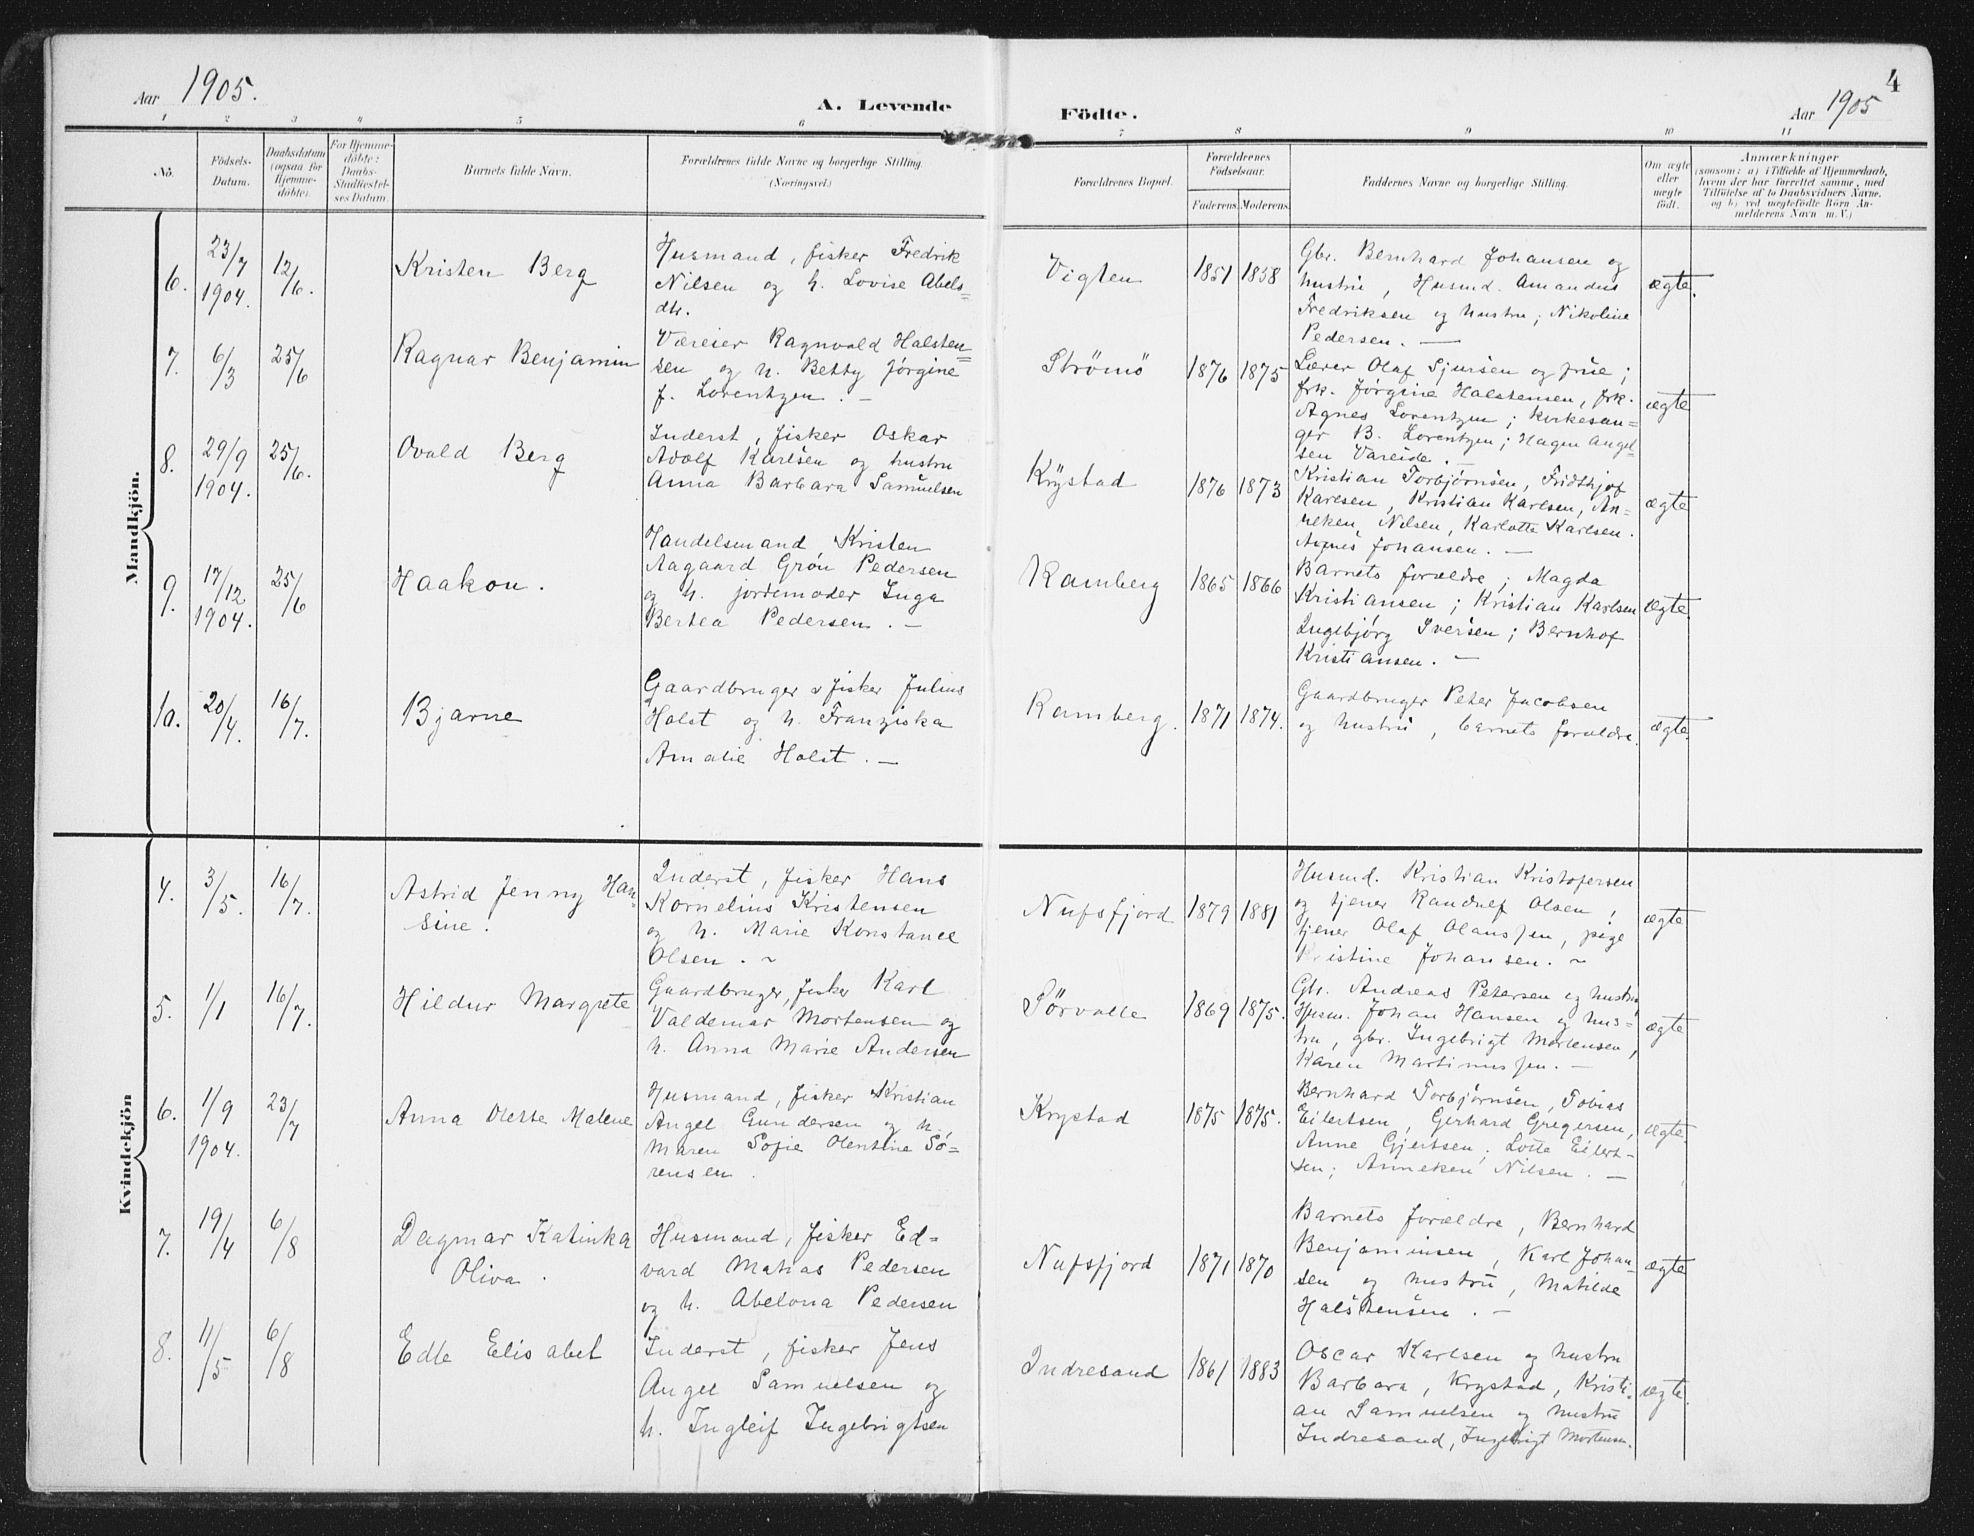 SAT, Ministerialprotokoller, klokkerbøker og fødselsregistre - Nordland, 885/L1206: Ministerialbok nr. 885A07, 1905-1915, s. 4